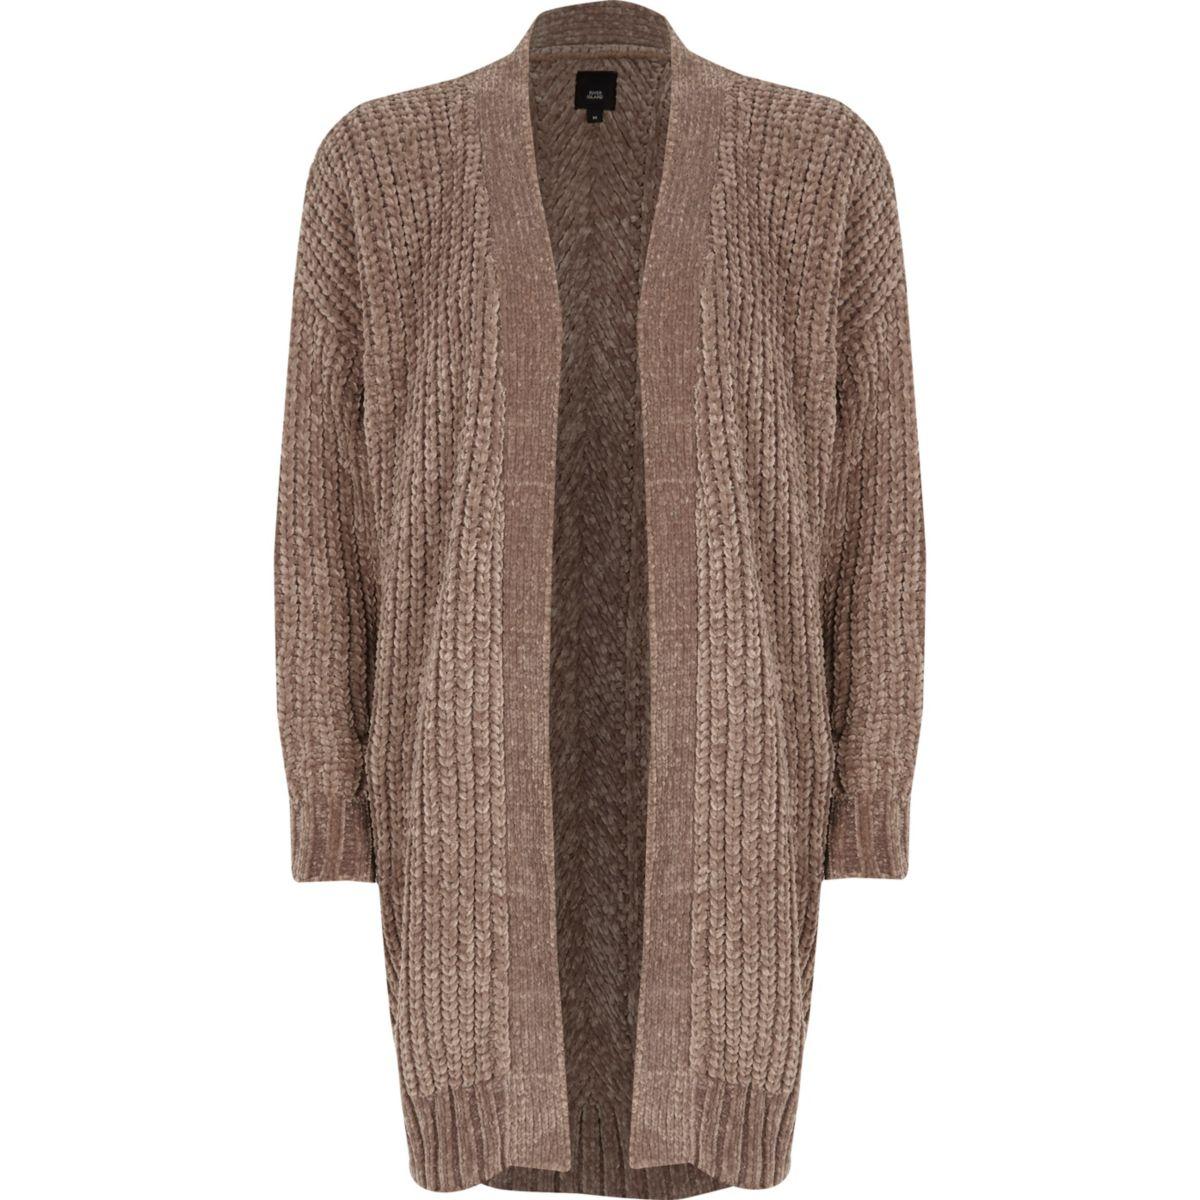 Light brown chenille longline cardigan